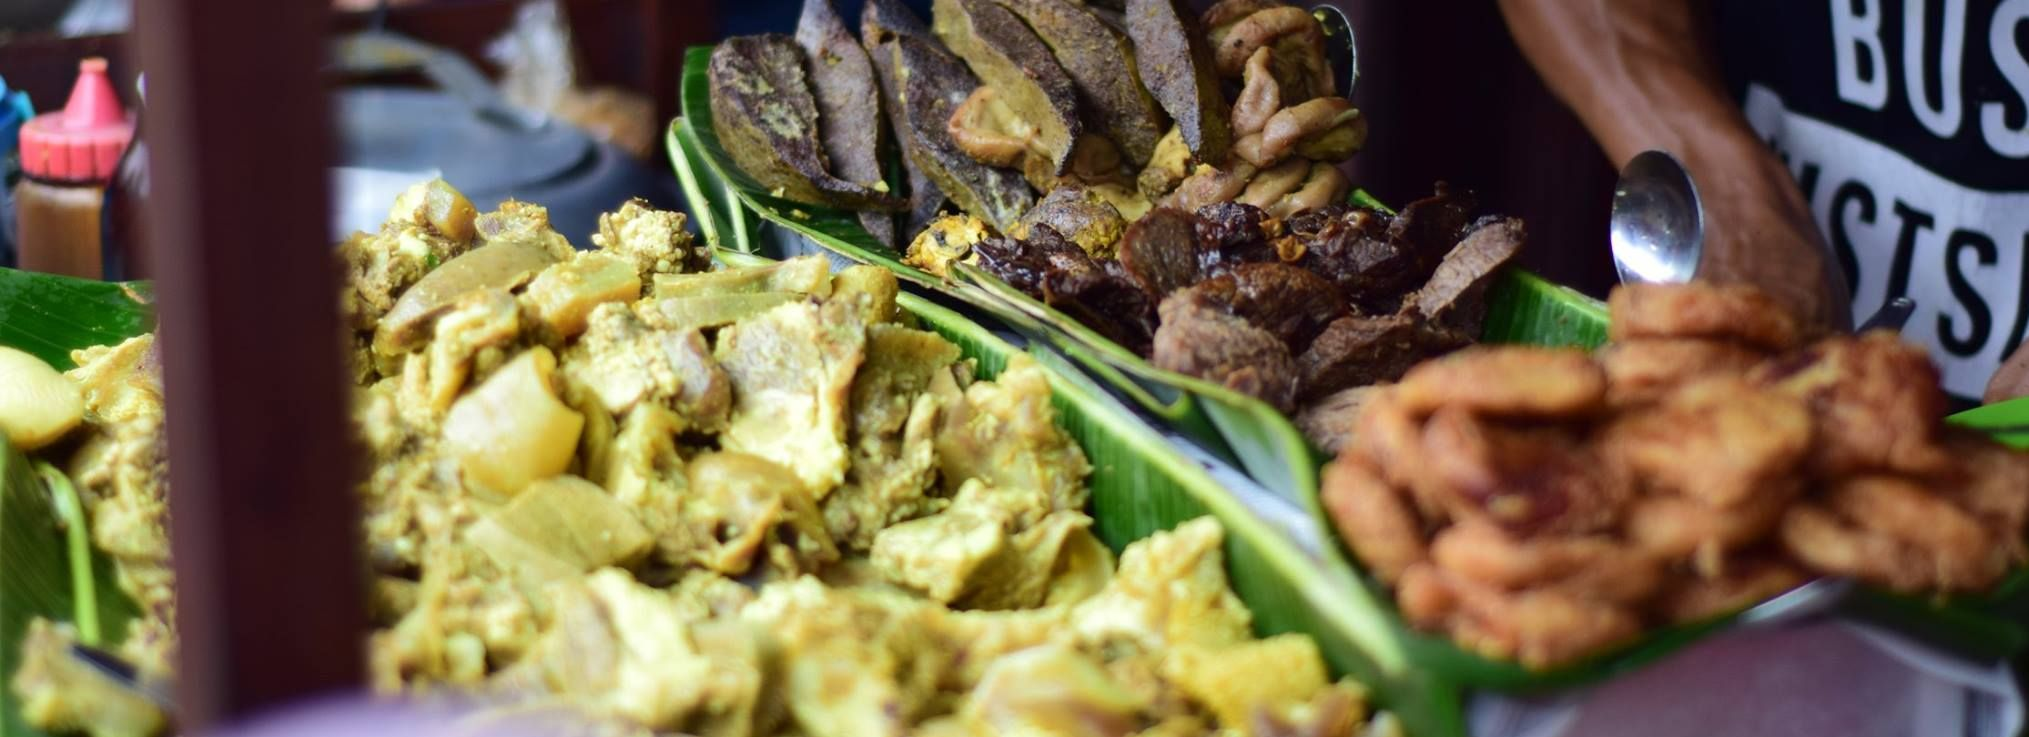 7 Wisata Kuliner Bogor Yang Nggak Boleh Dilewatkan Go